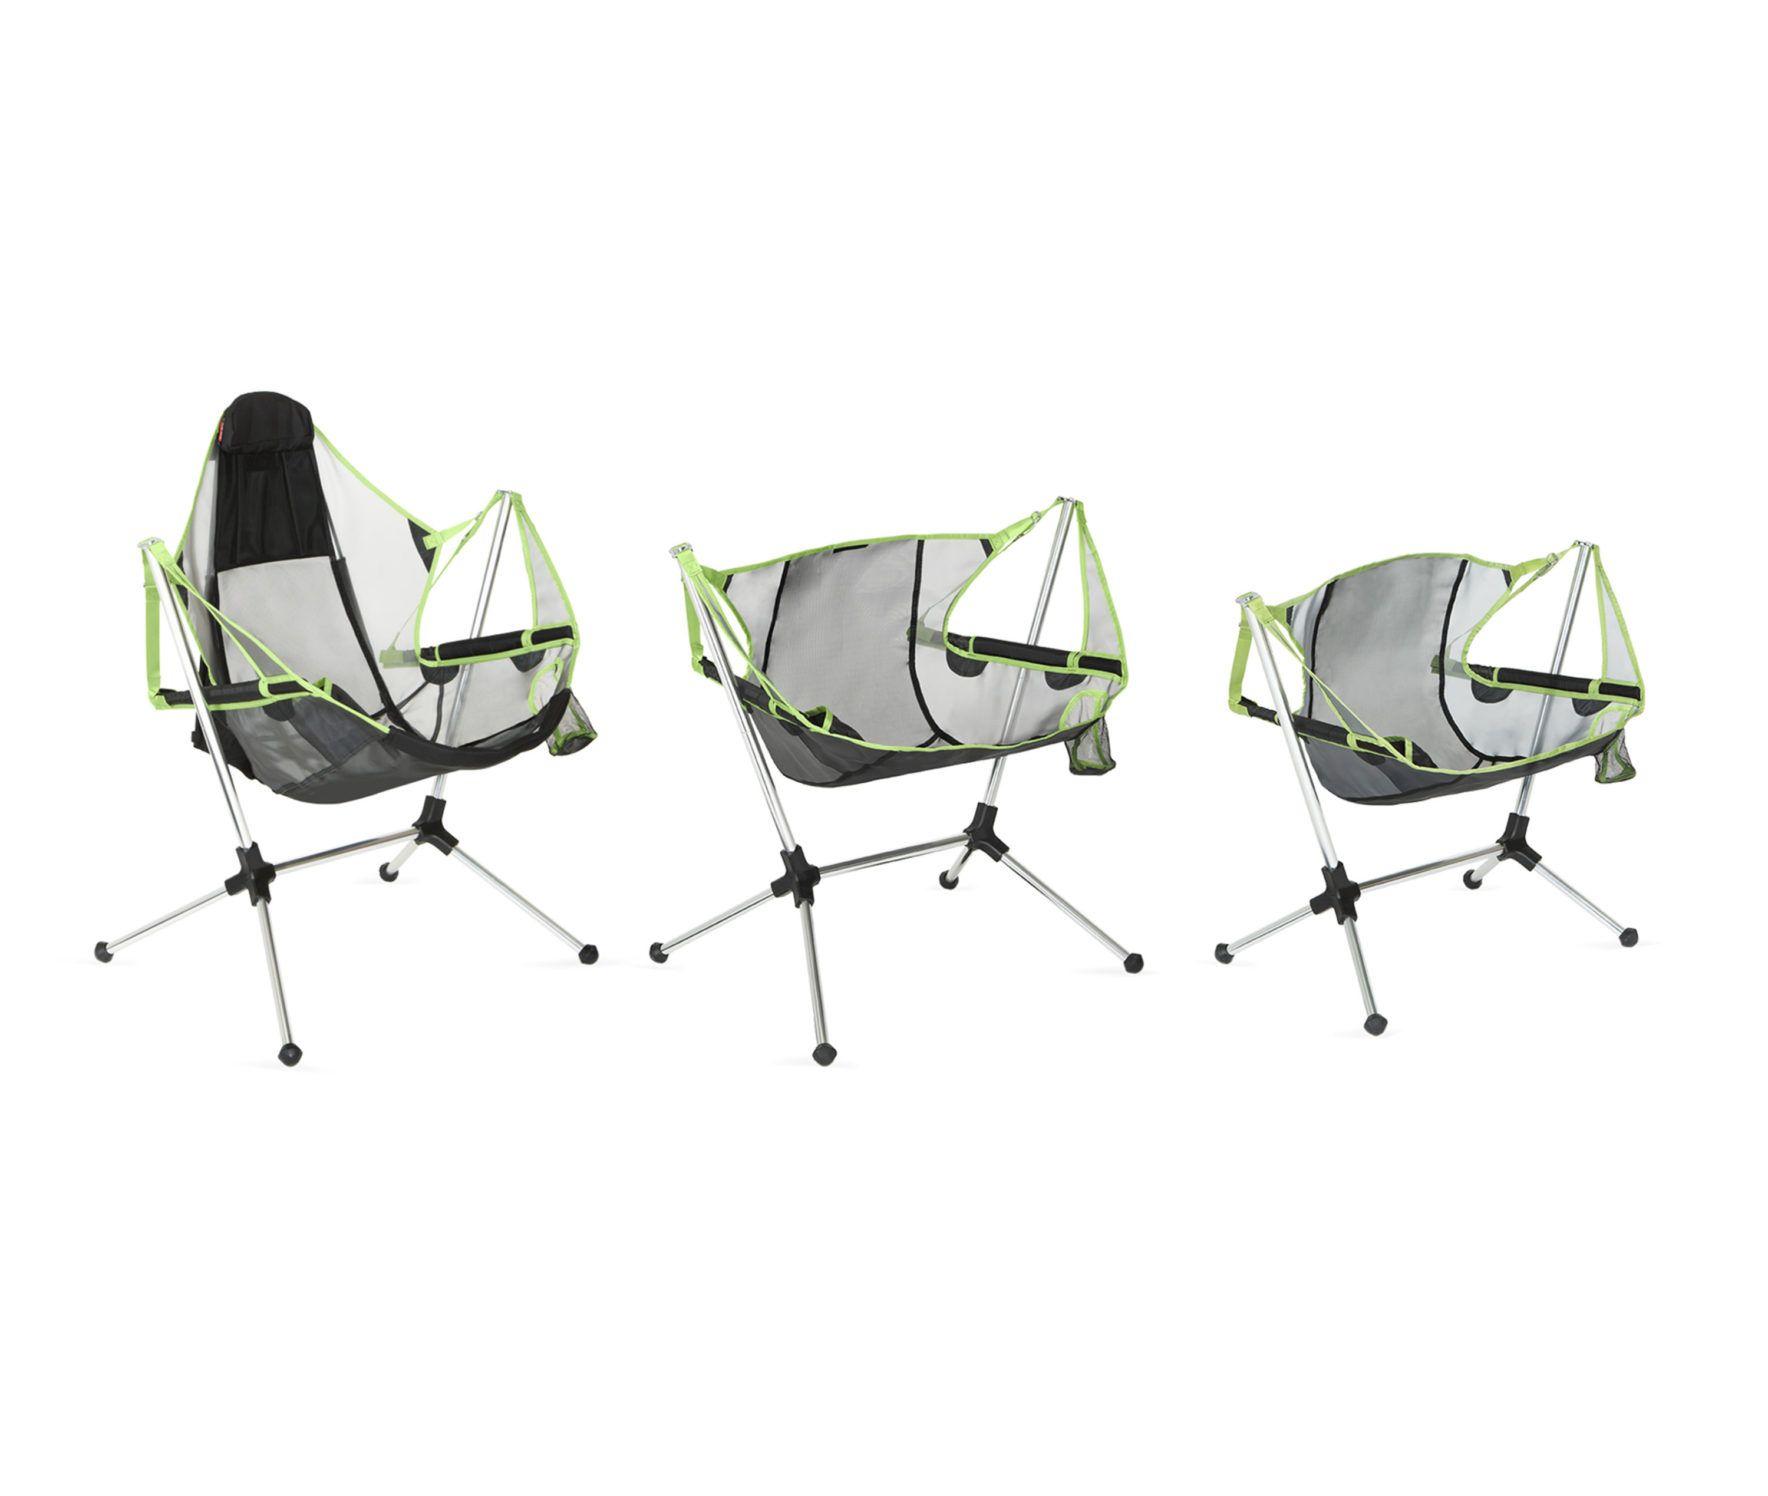 Stargaze™ Recliner Chair 2018 Recliner chair, Recliner